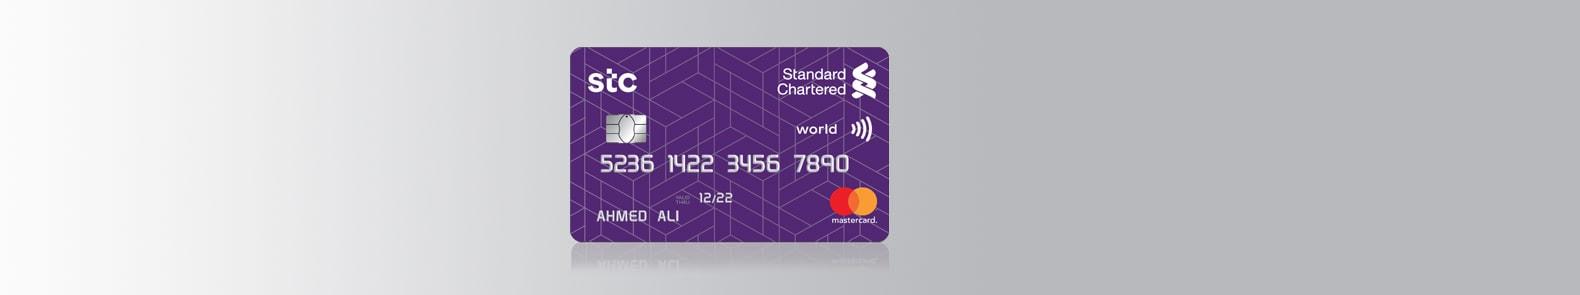 stc credit card